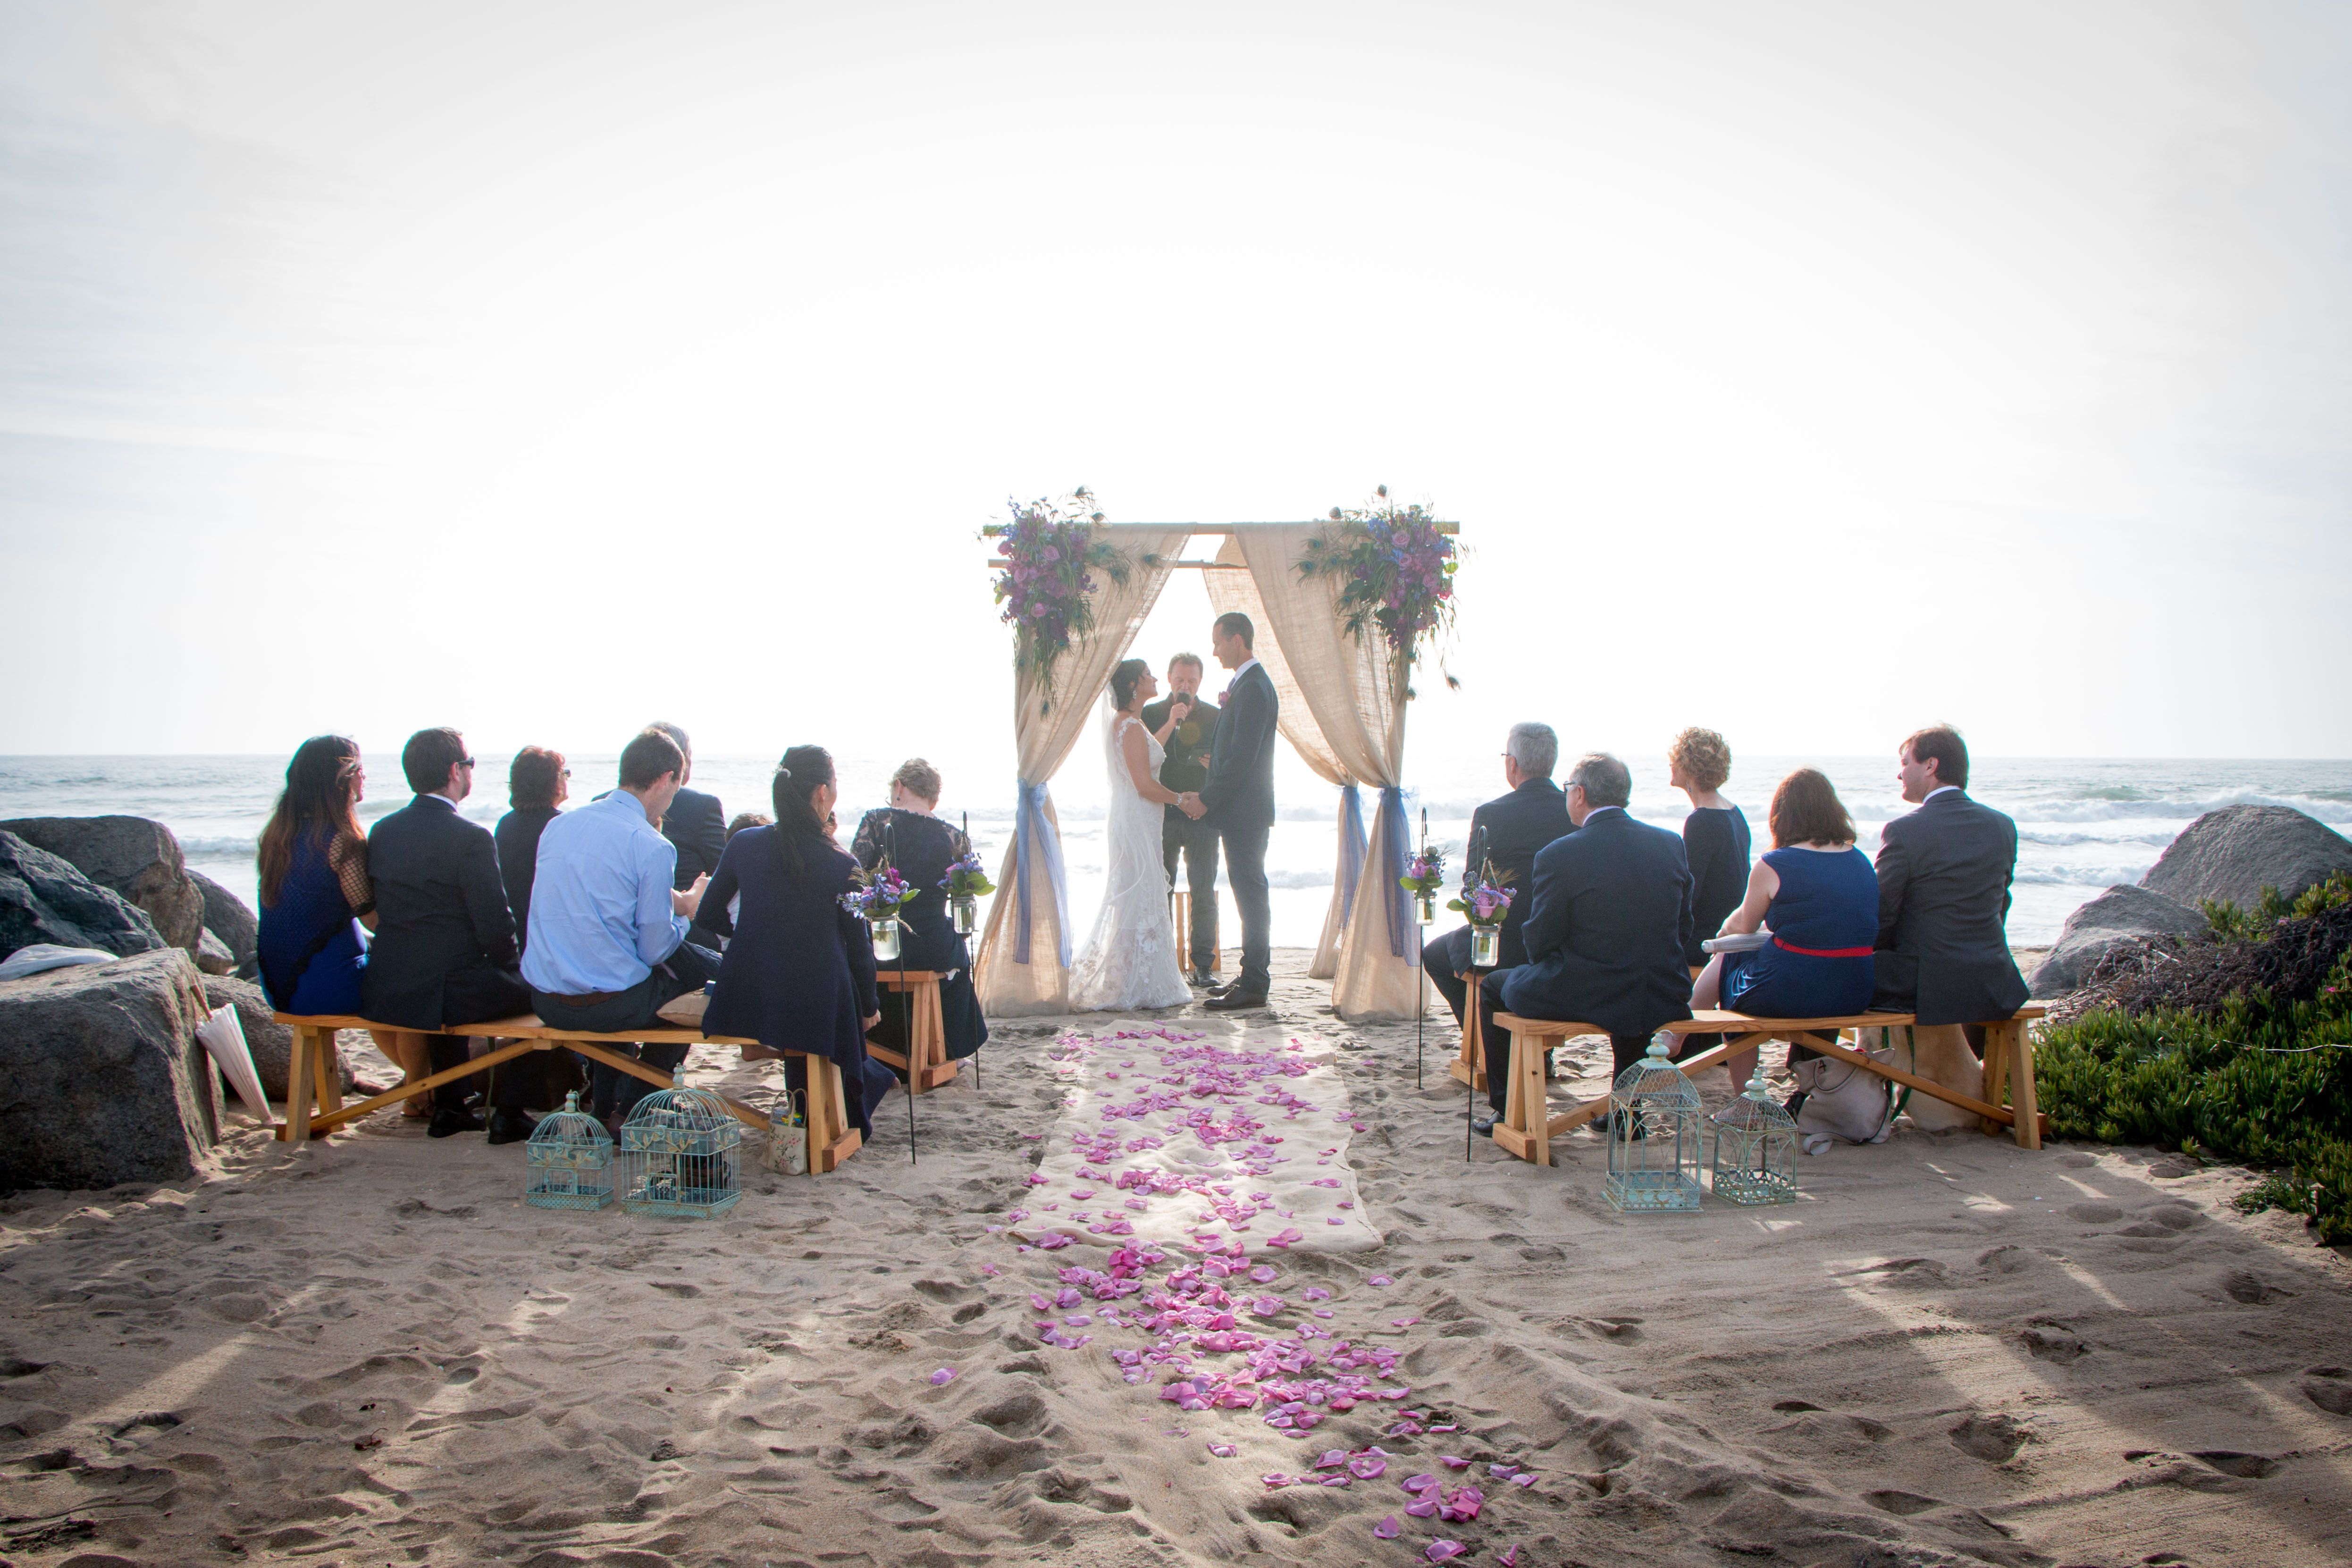 Pin By Dream Beach Wedding San Dieg On Canopies By Dream Beach Wedding San Diego Dream Beach Wedding San Diego Wedding Venues San Diego Beach Wedding